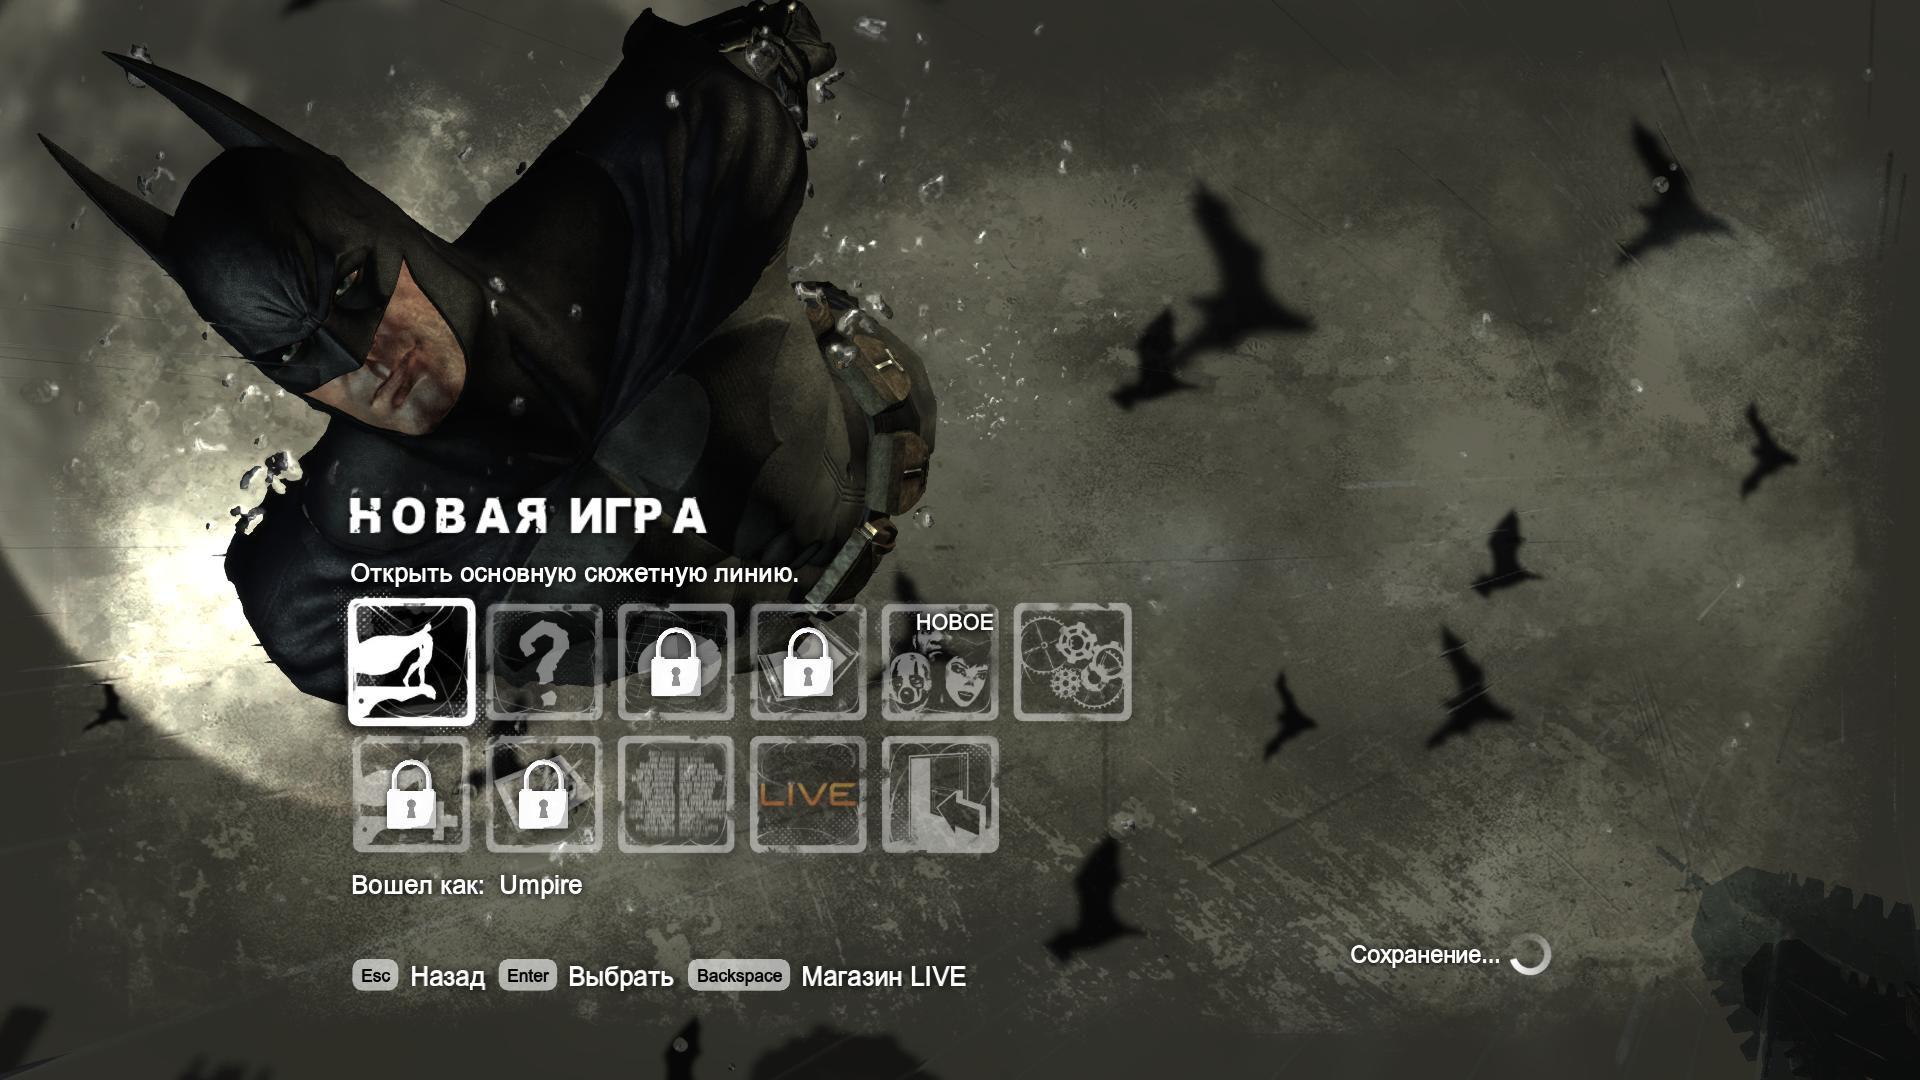 BatmanAC 2011-12-01 12-42-17-01.jpg